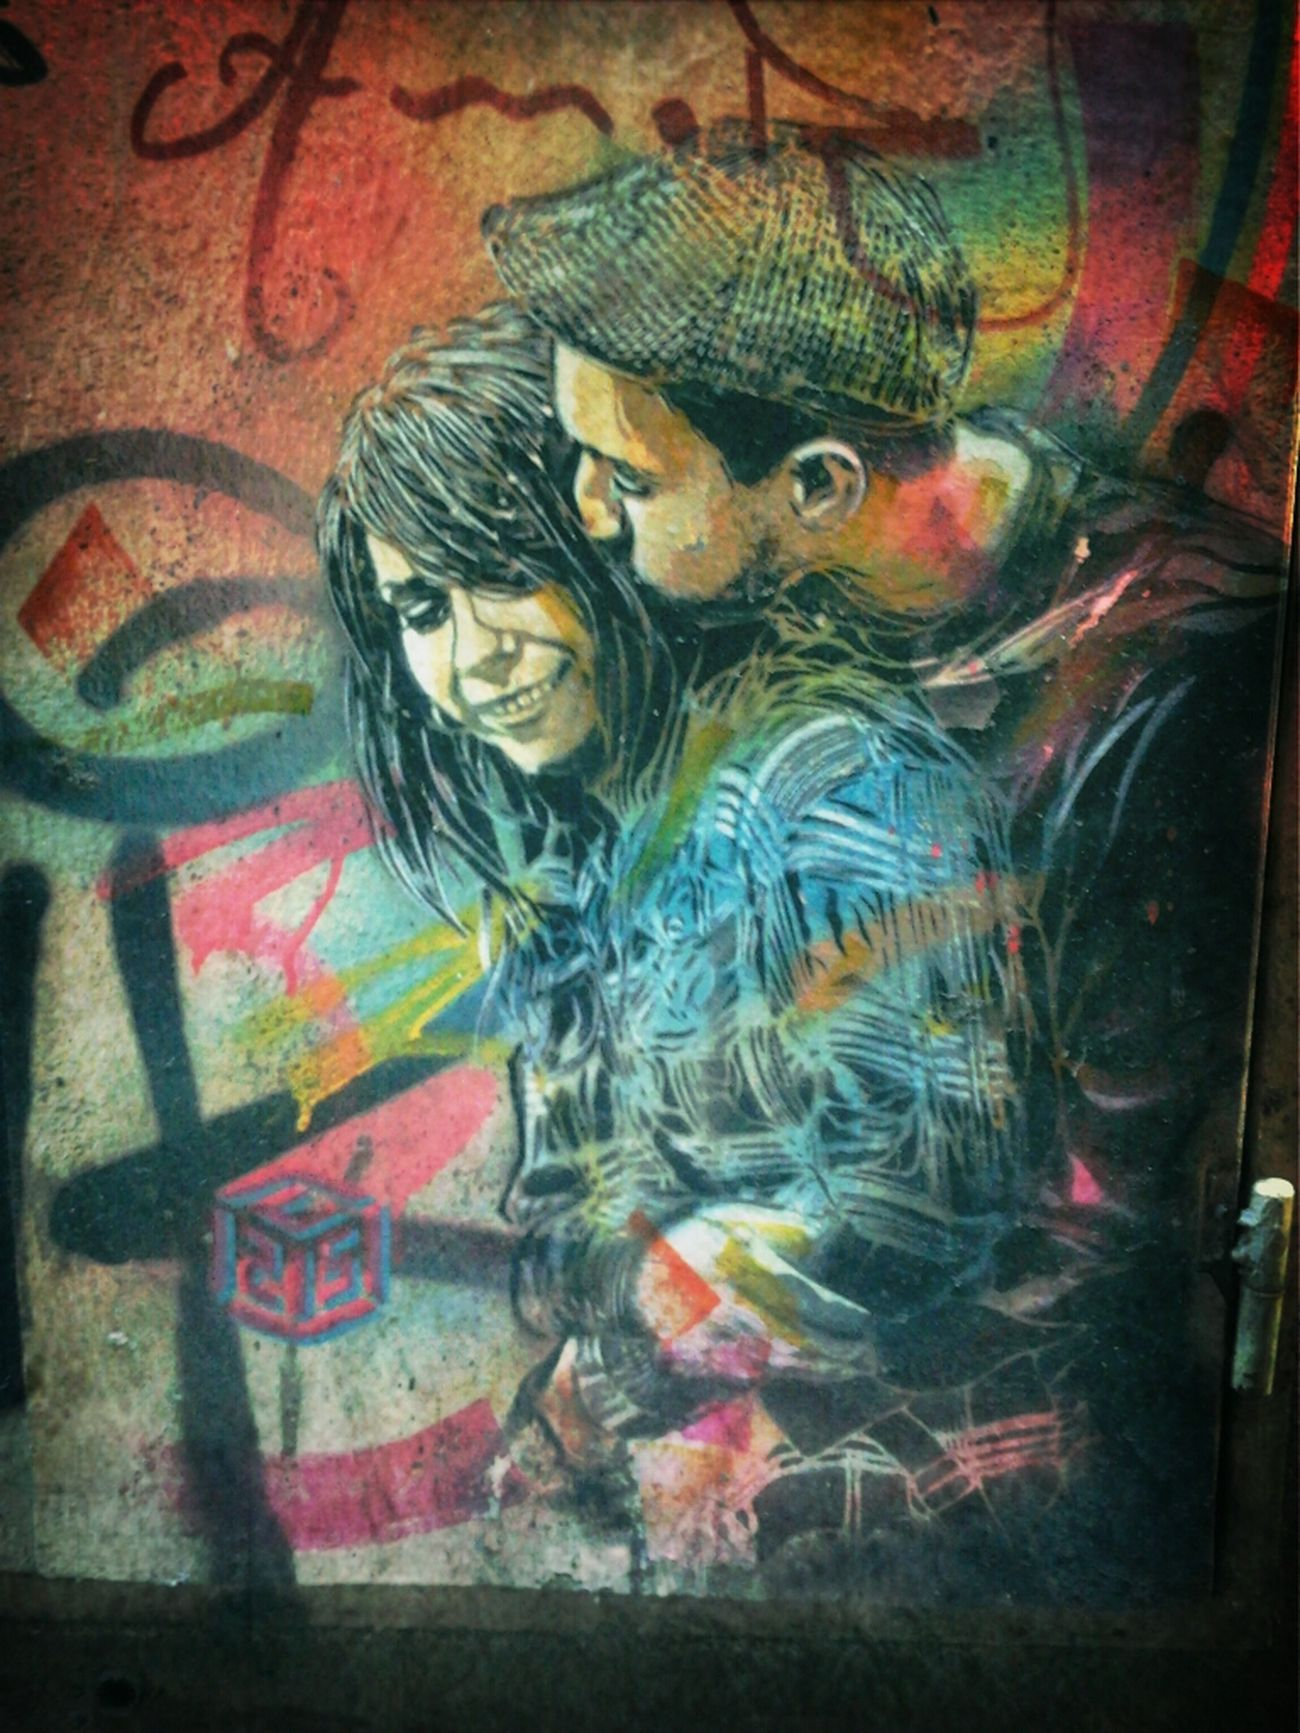 Streetphotography Stencil Art #C215